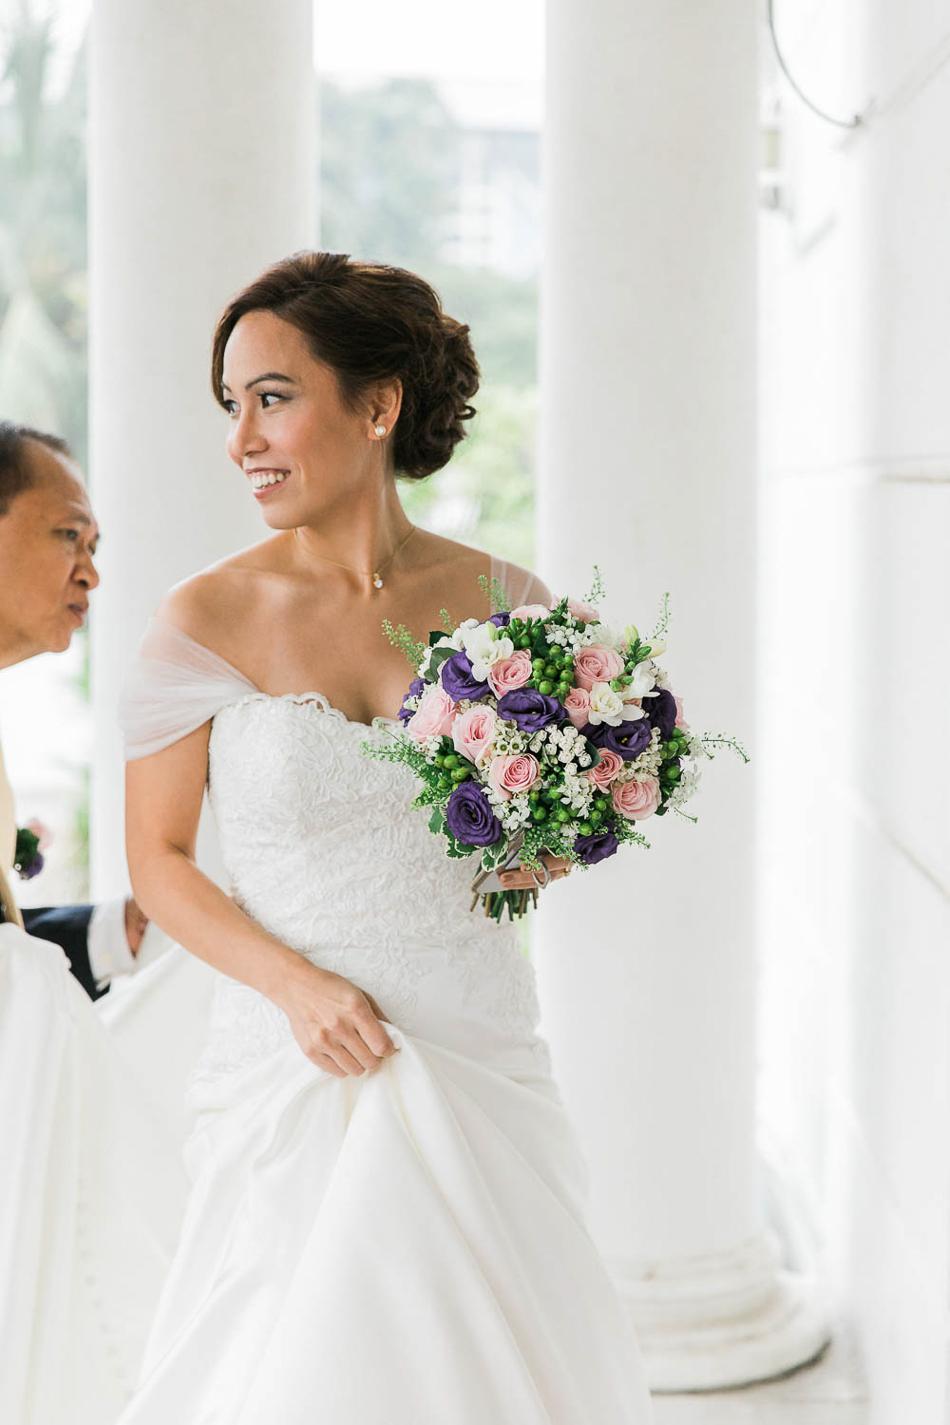 wedding-photographer-singapore-film-photographer-chen-sands-Anglea-wedding-CSPBLOG-6.jpg